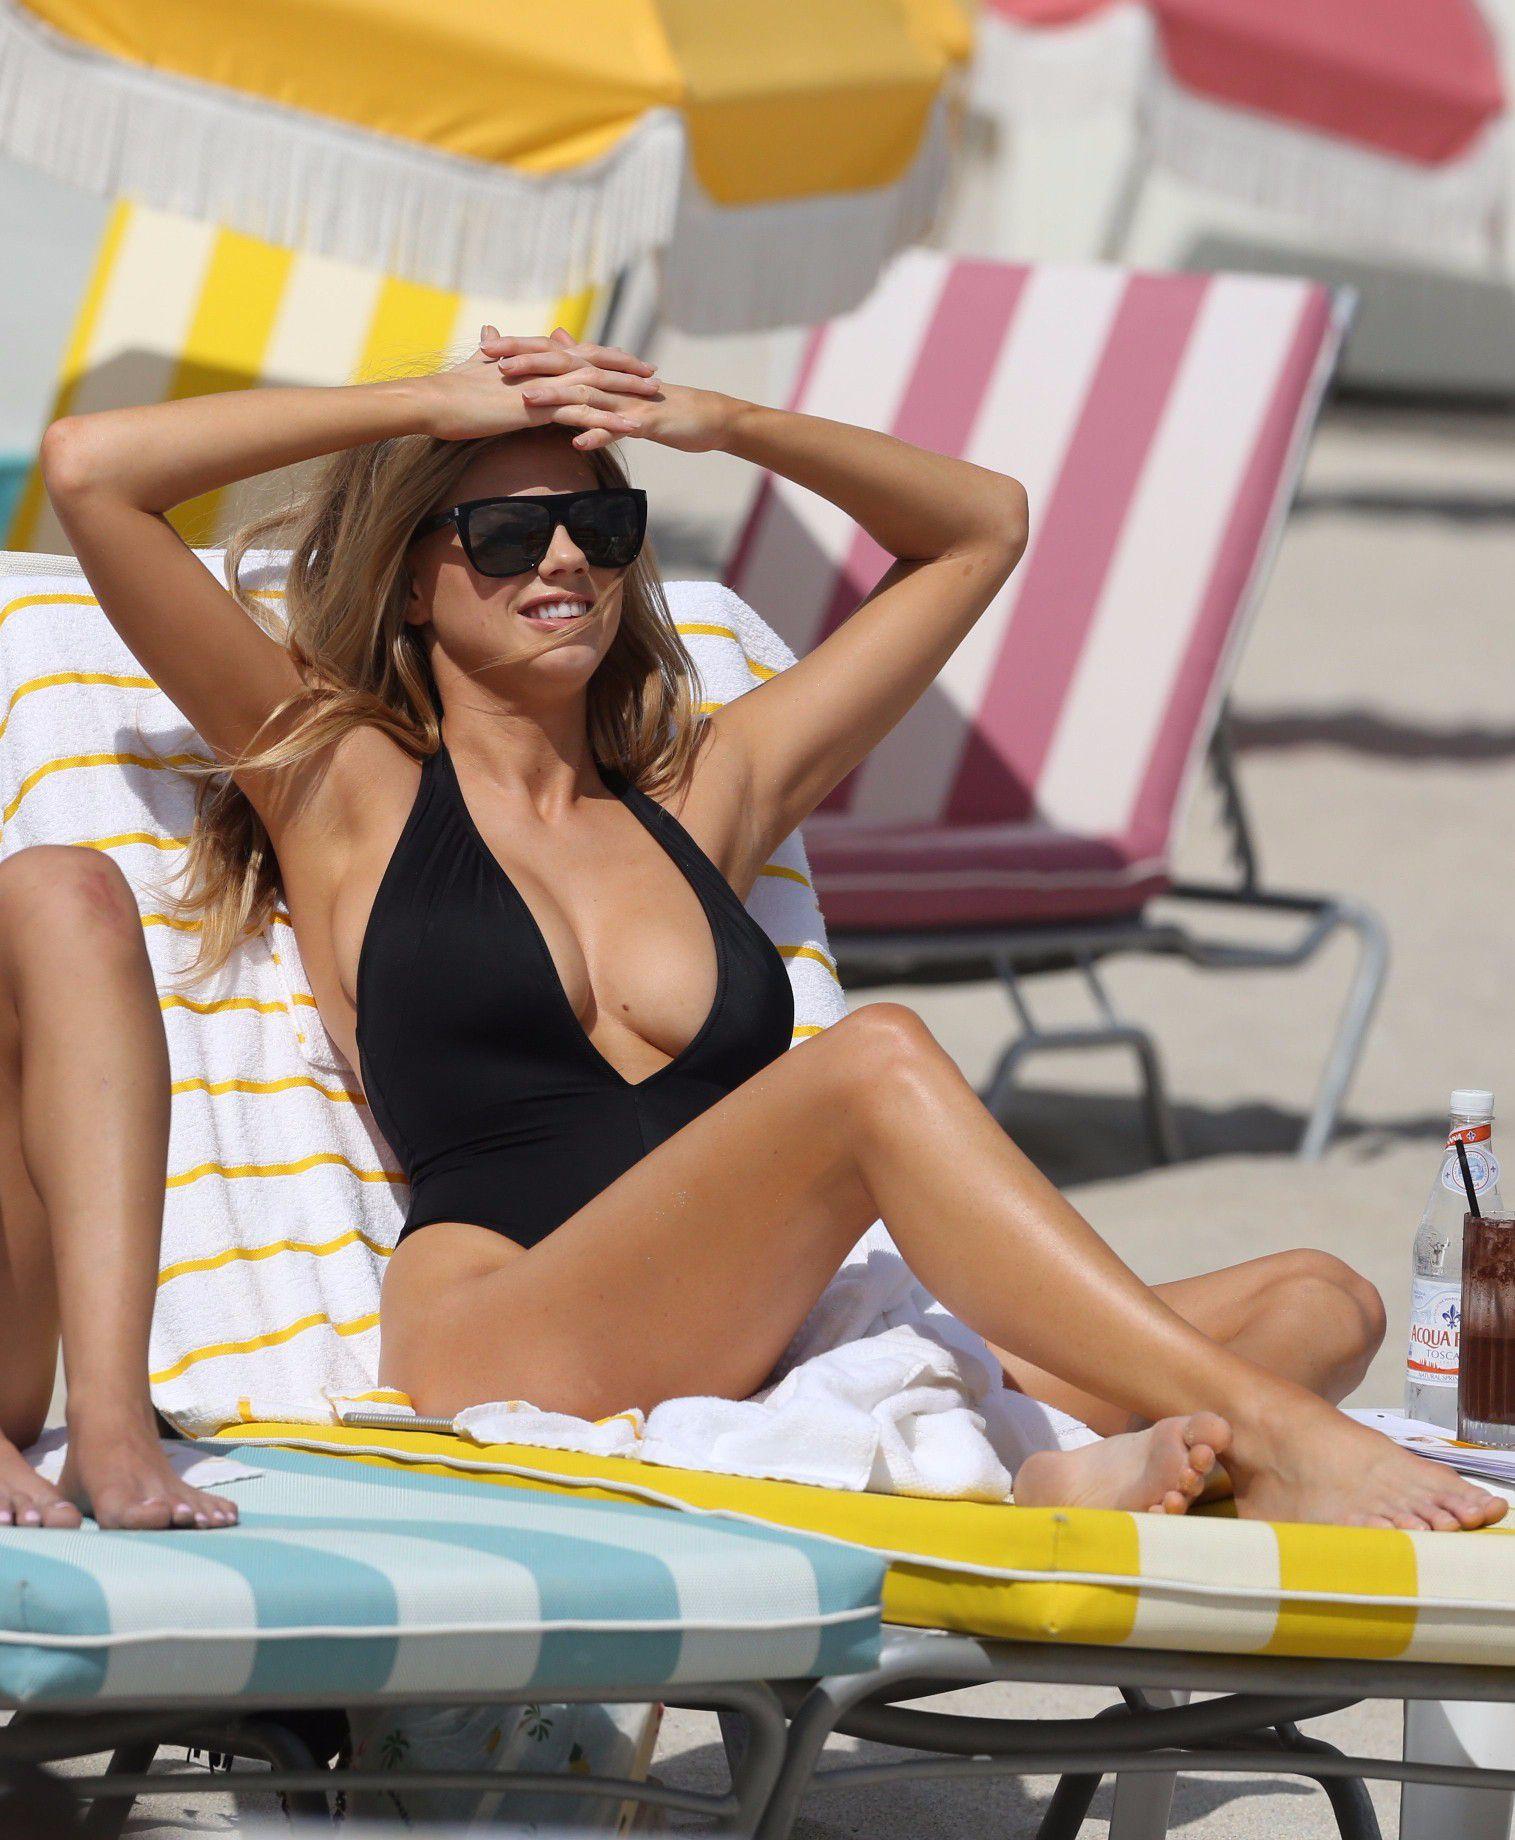 charlotte-mckinney-nipple-slip-at-the-beach-in-miami-11